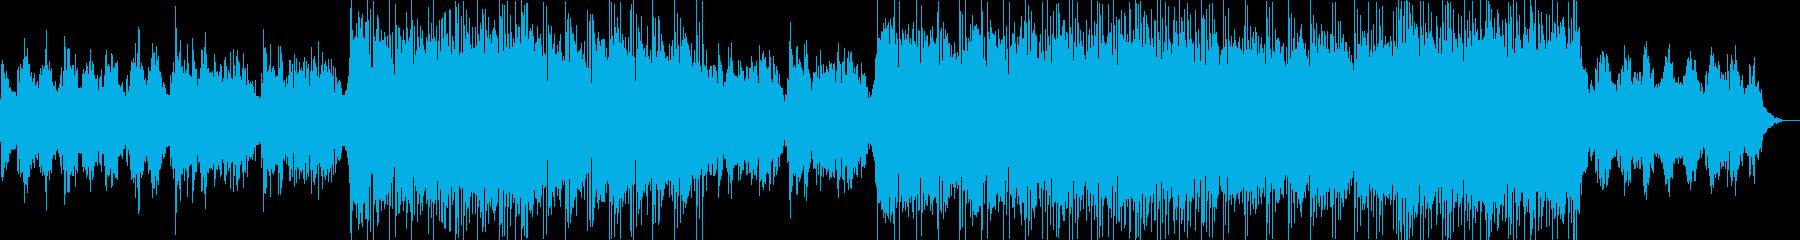 R&B英語/女性ボーカル/バラードの再生済みの波形